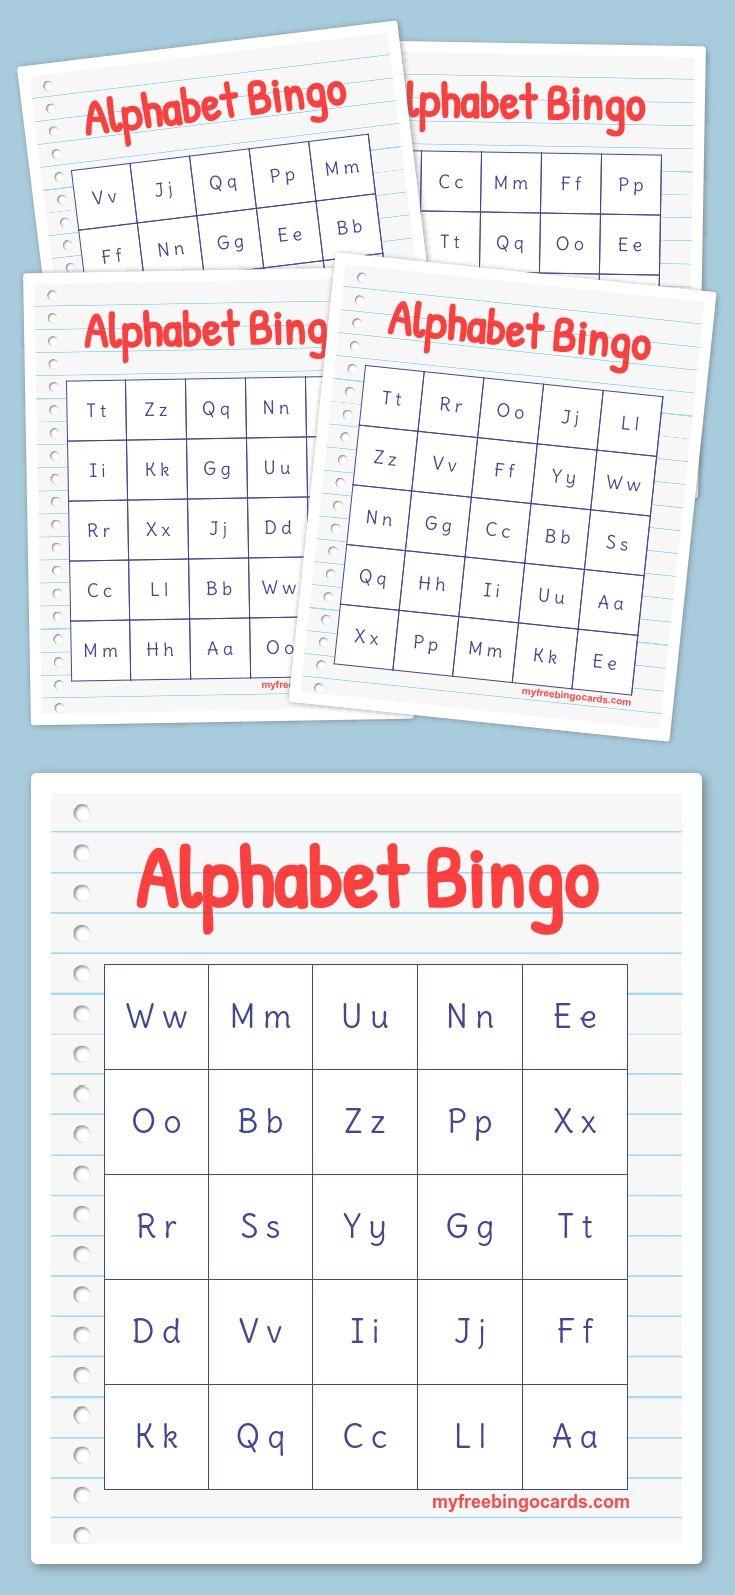 Myfreebingocards | Tubidportal - Free Printable Bingo Cards 1 75